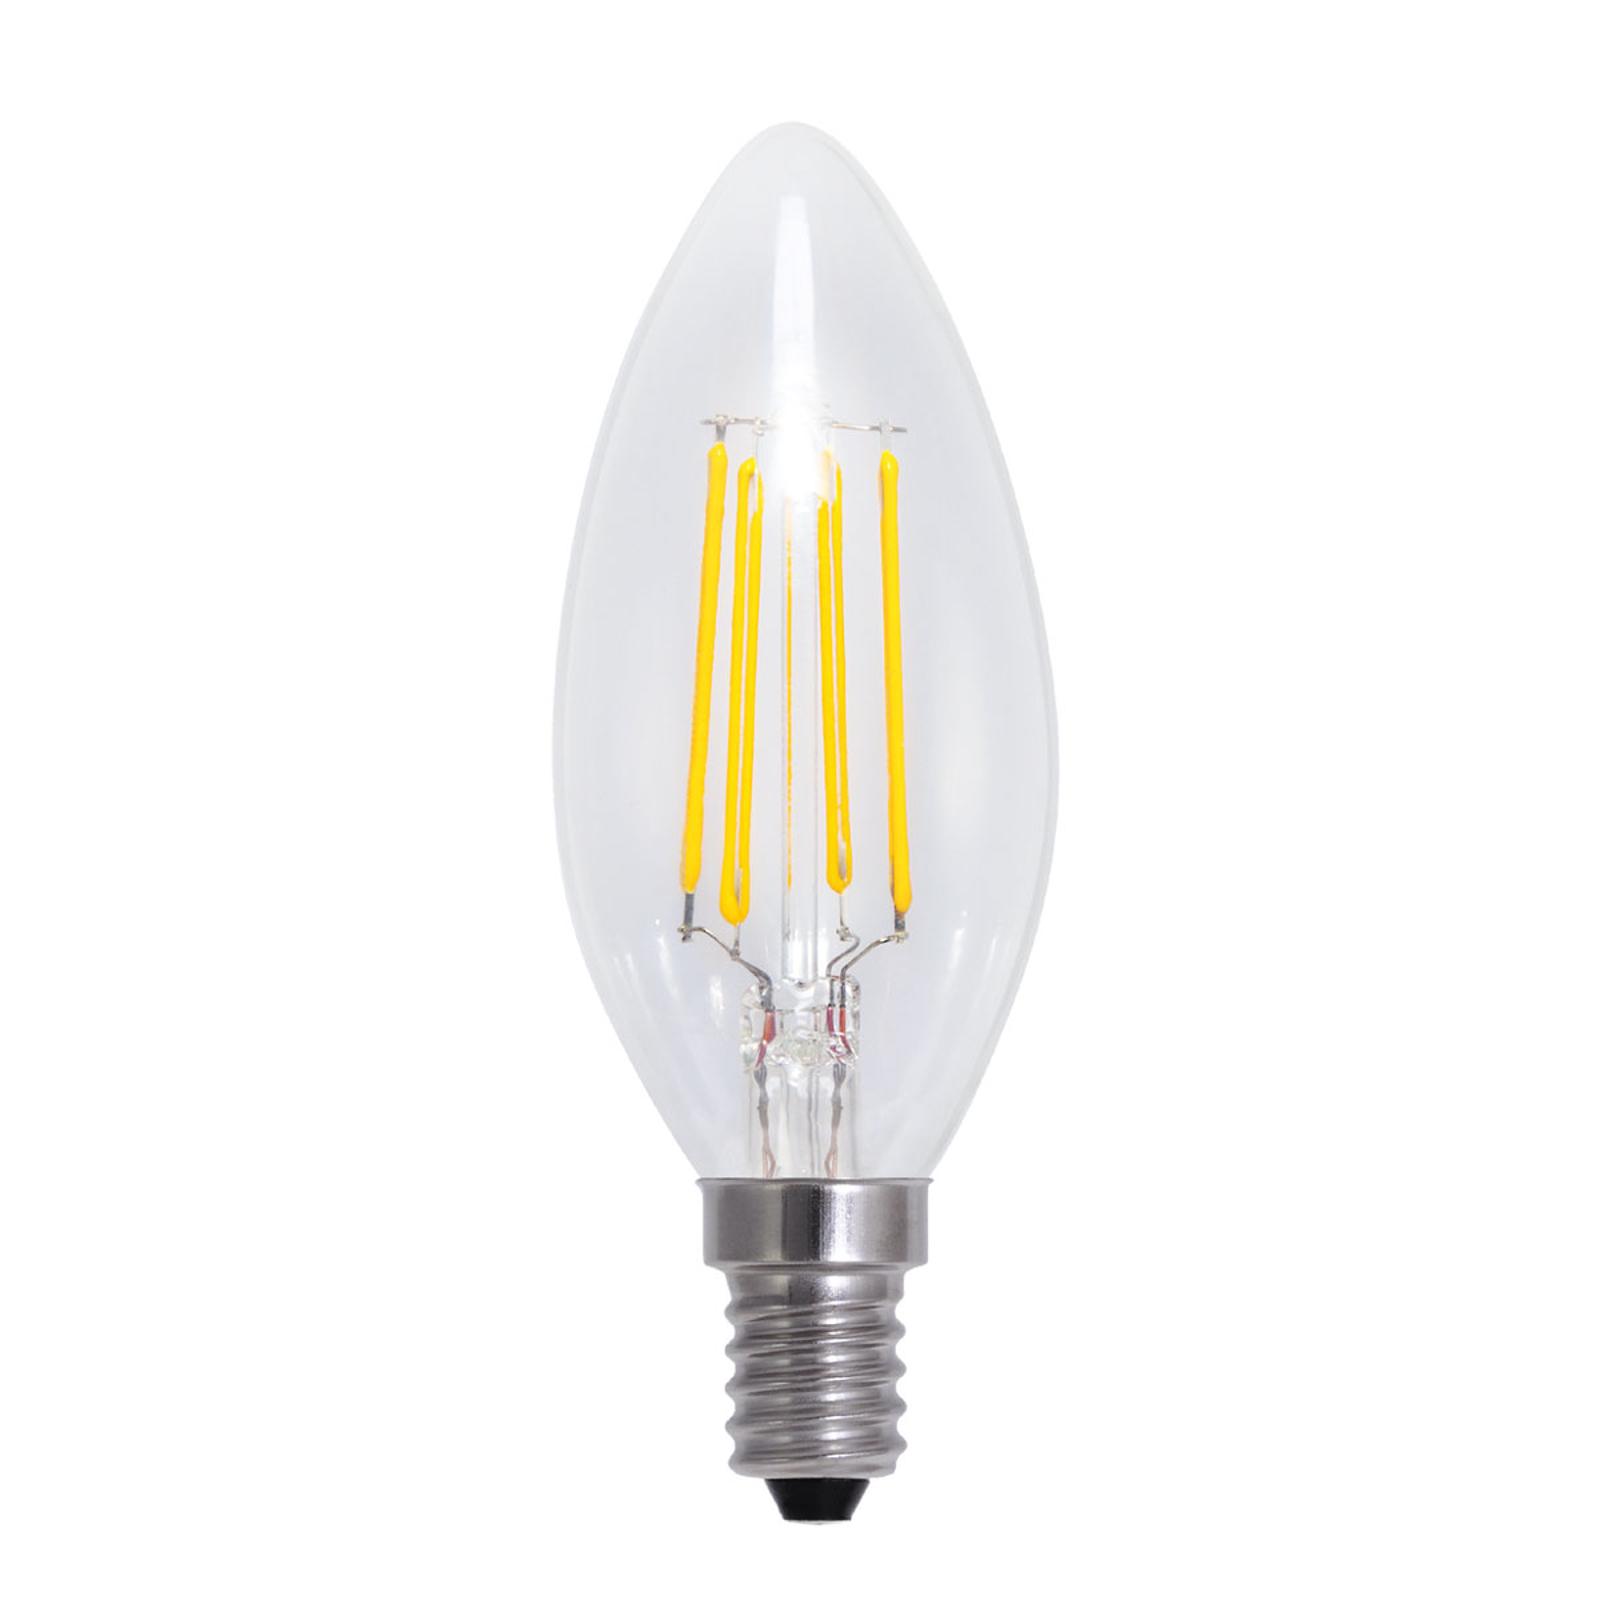 E14 4W 826 LED-Kerzenlampe in Kohlefadenoptik